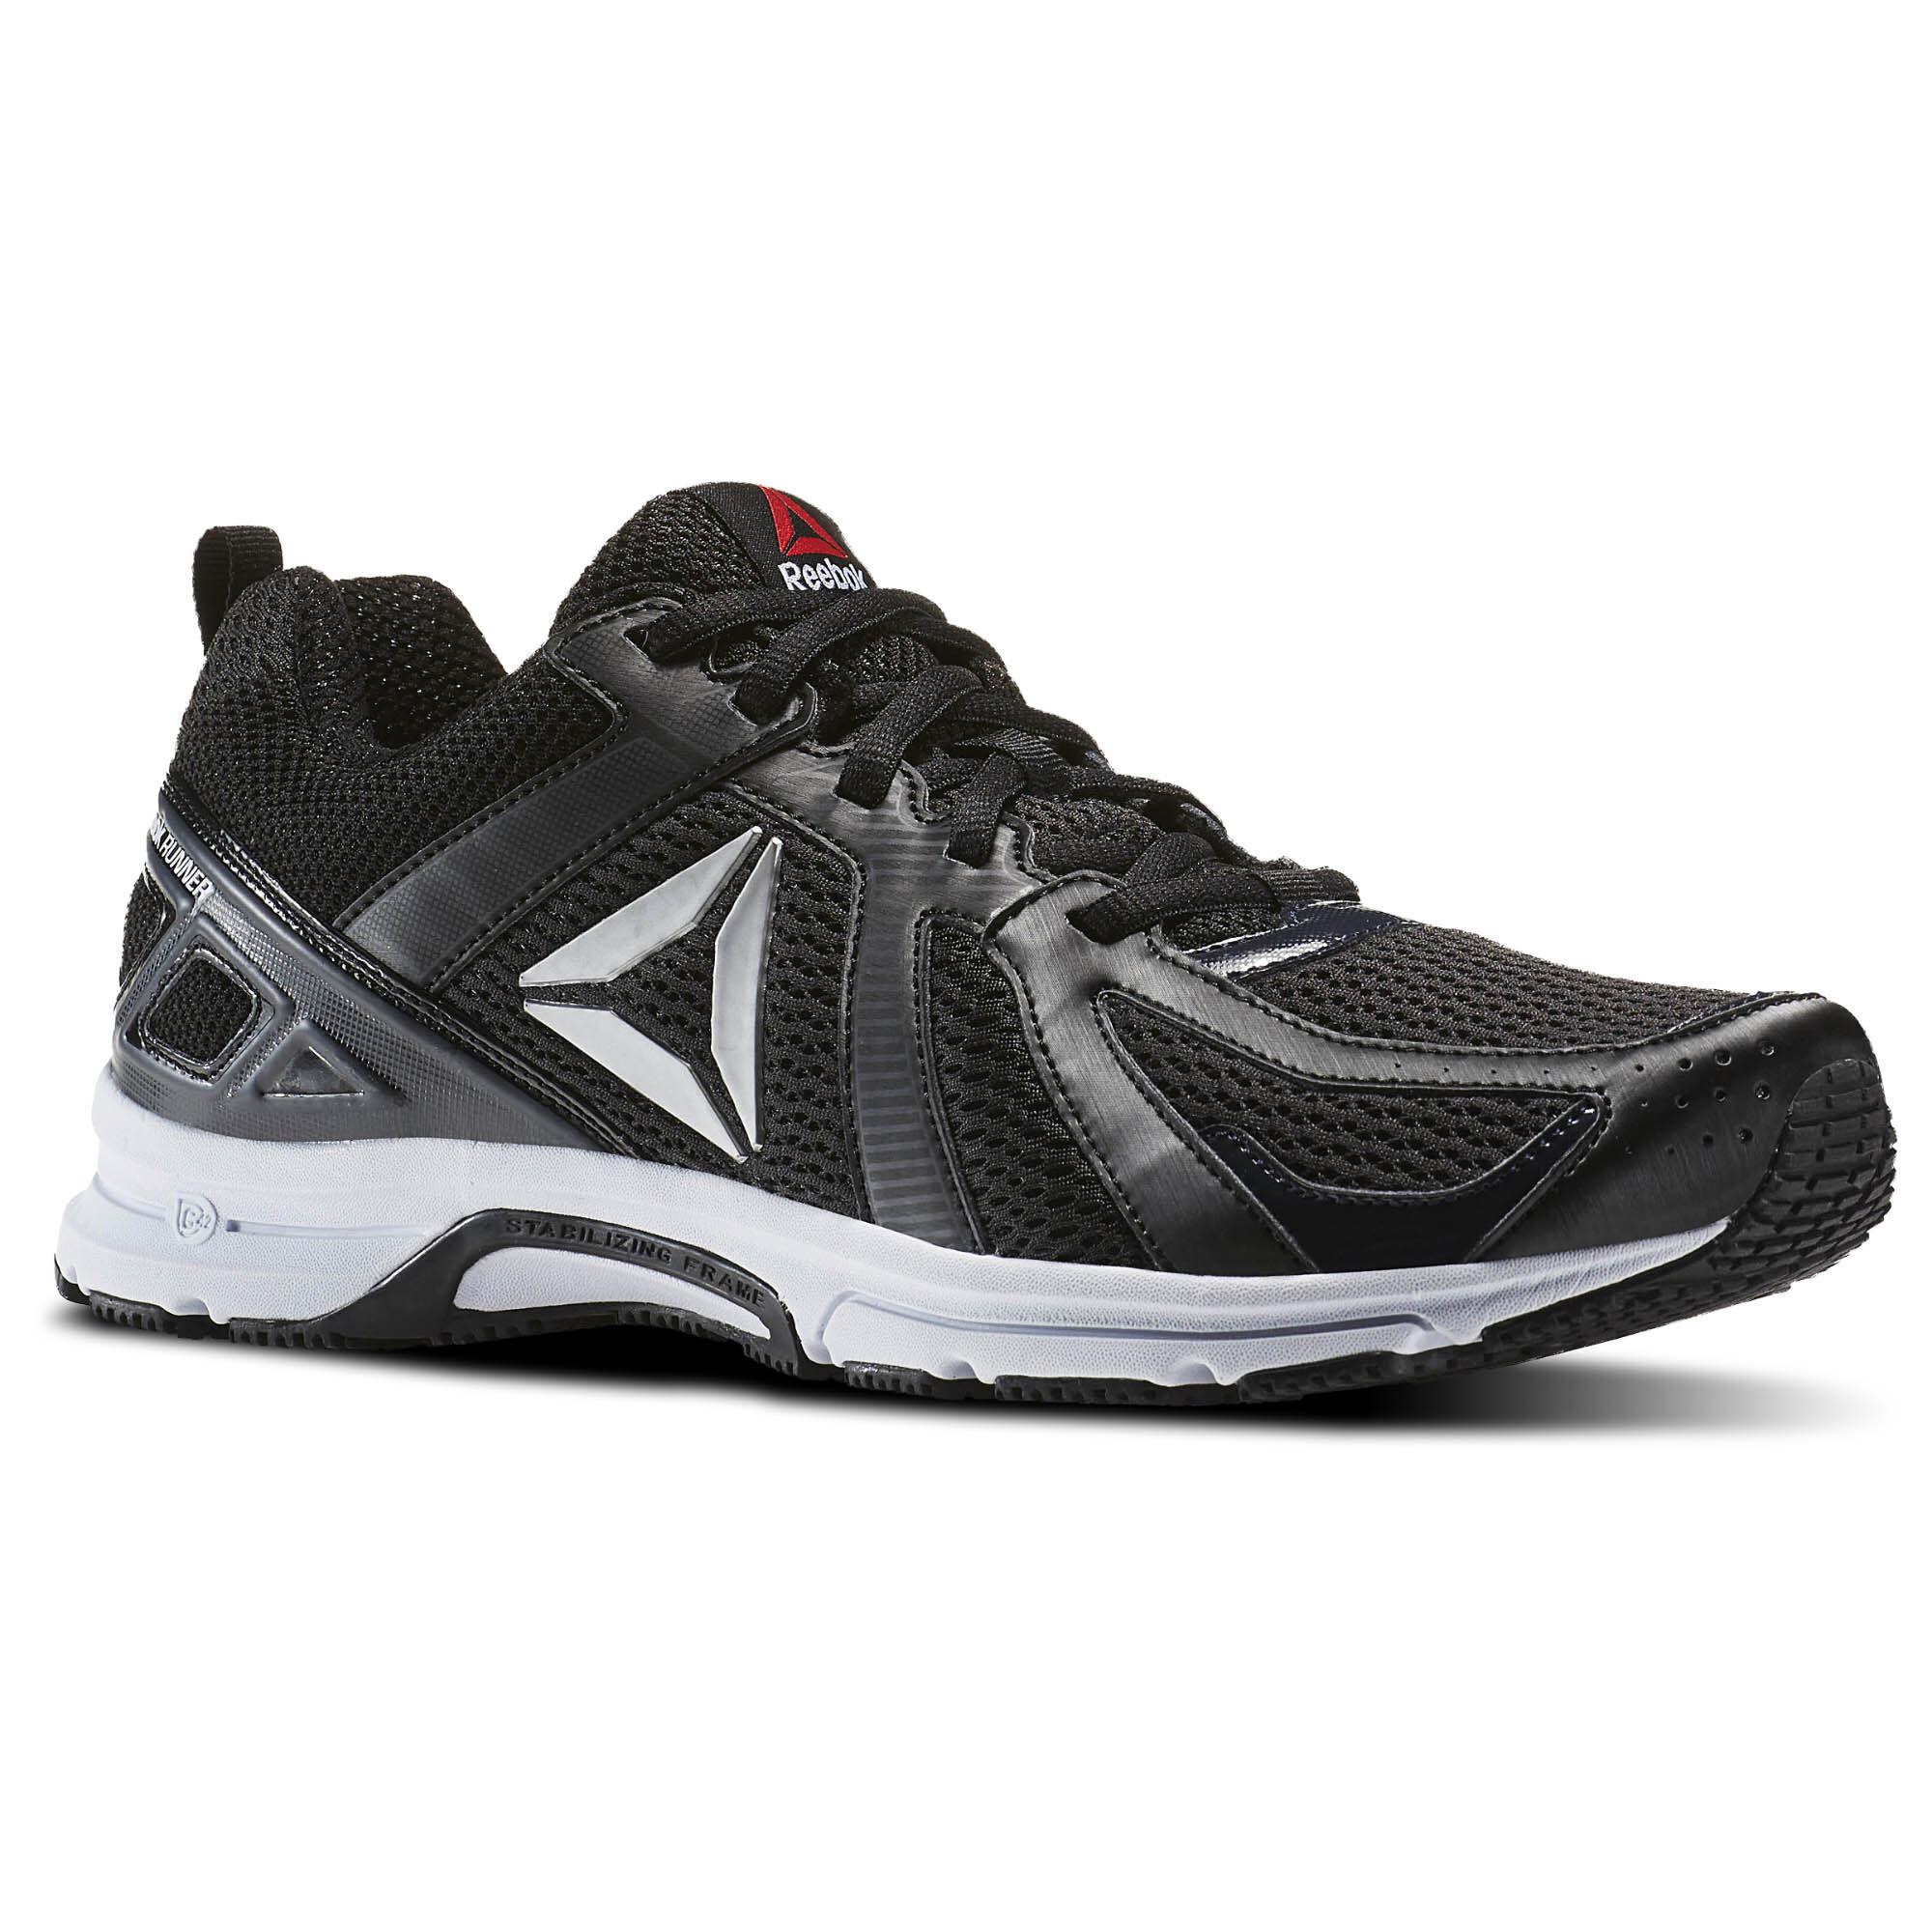 a9c8e2ebcb4079 Buy reebok shoes usa online   OFF42% Discounted